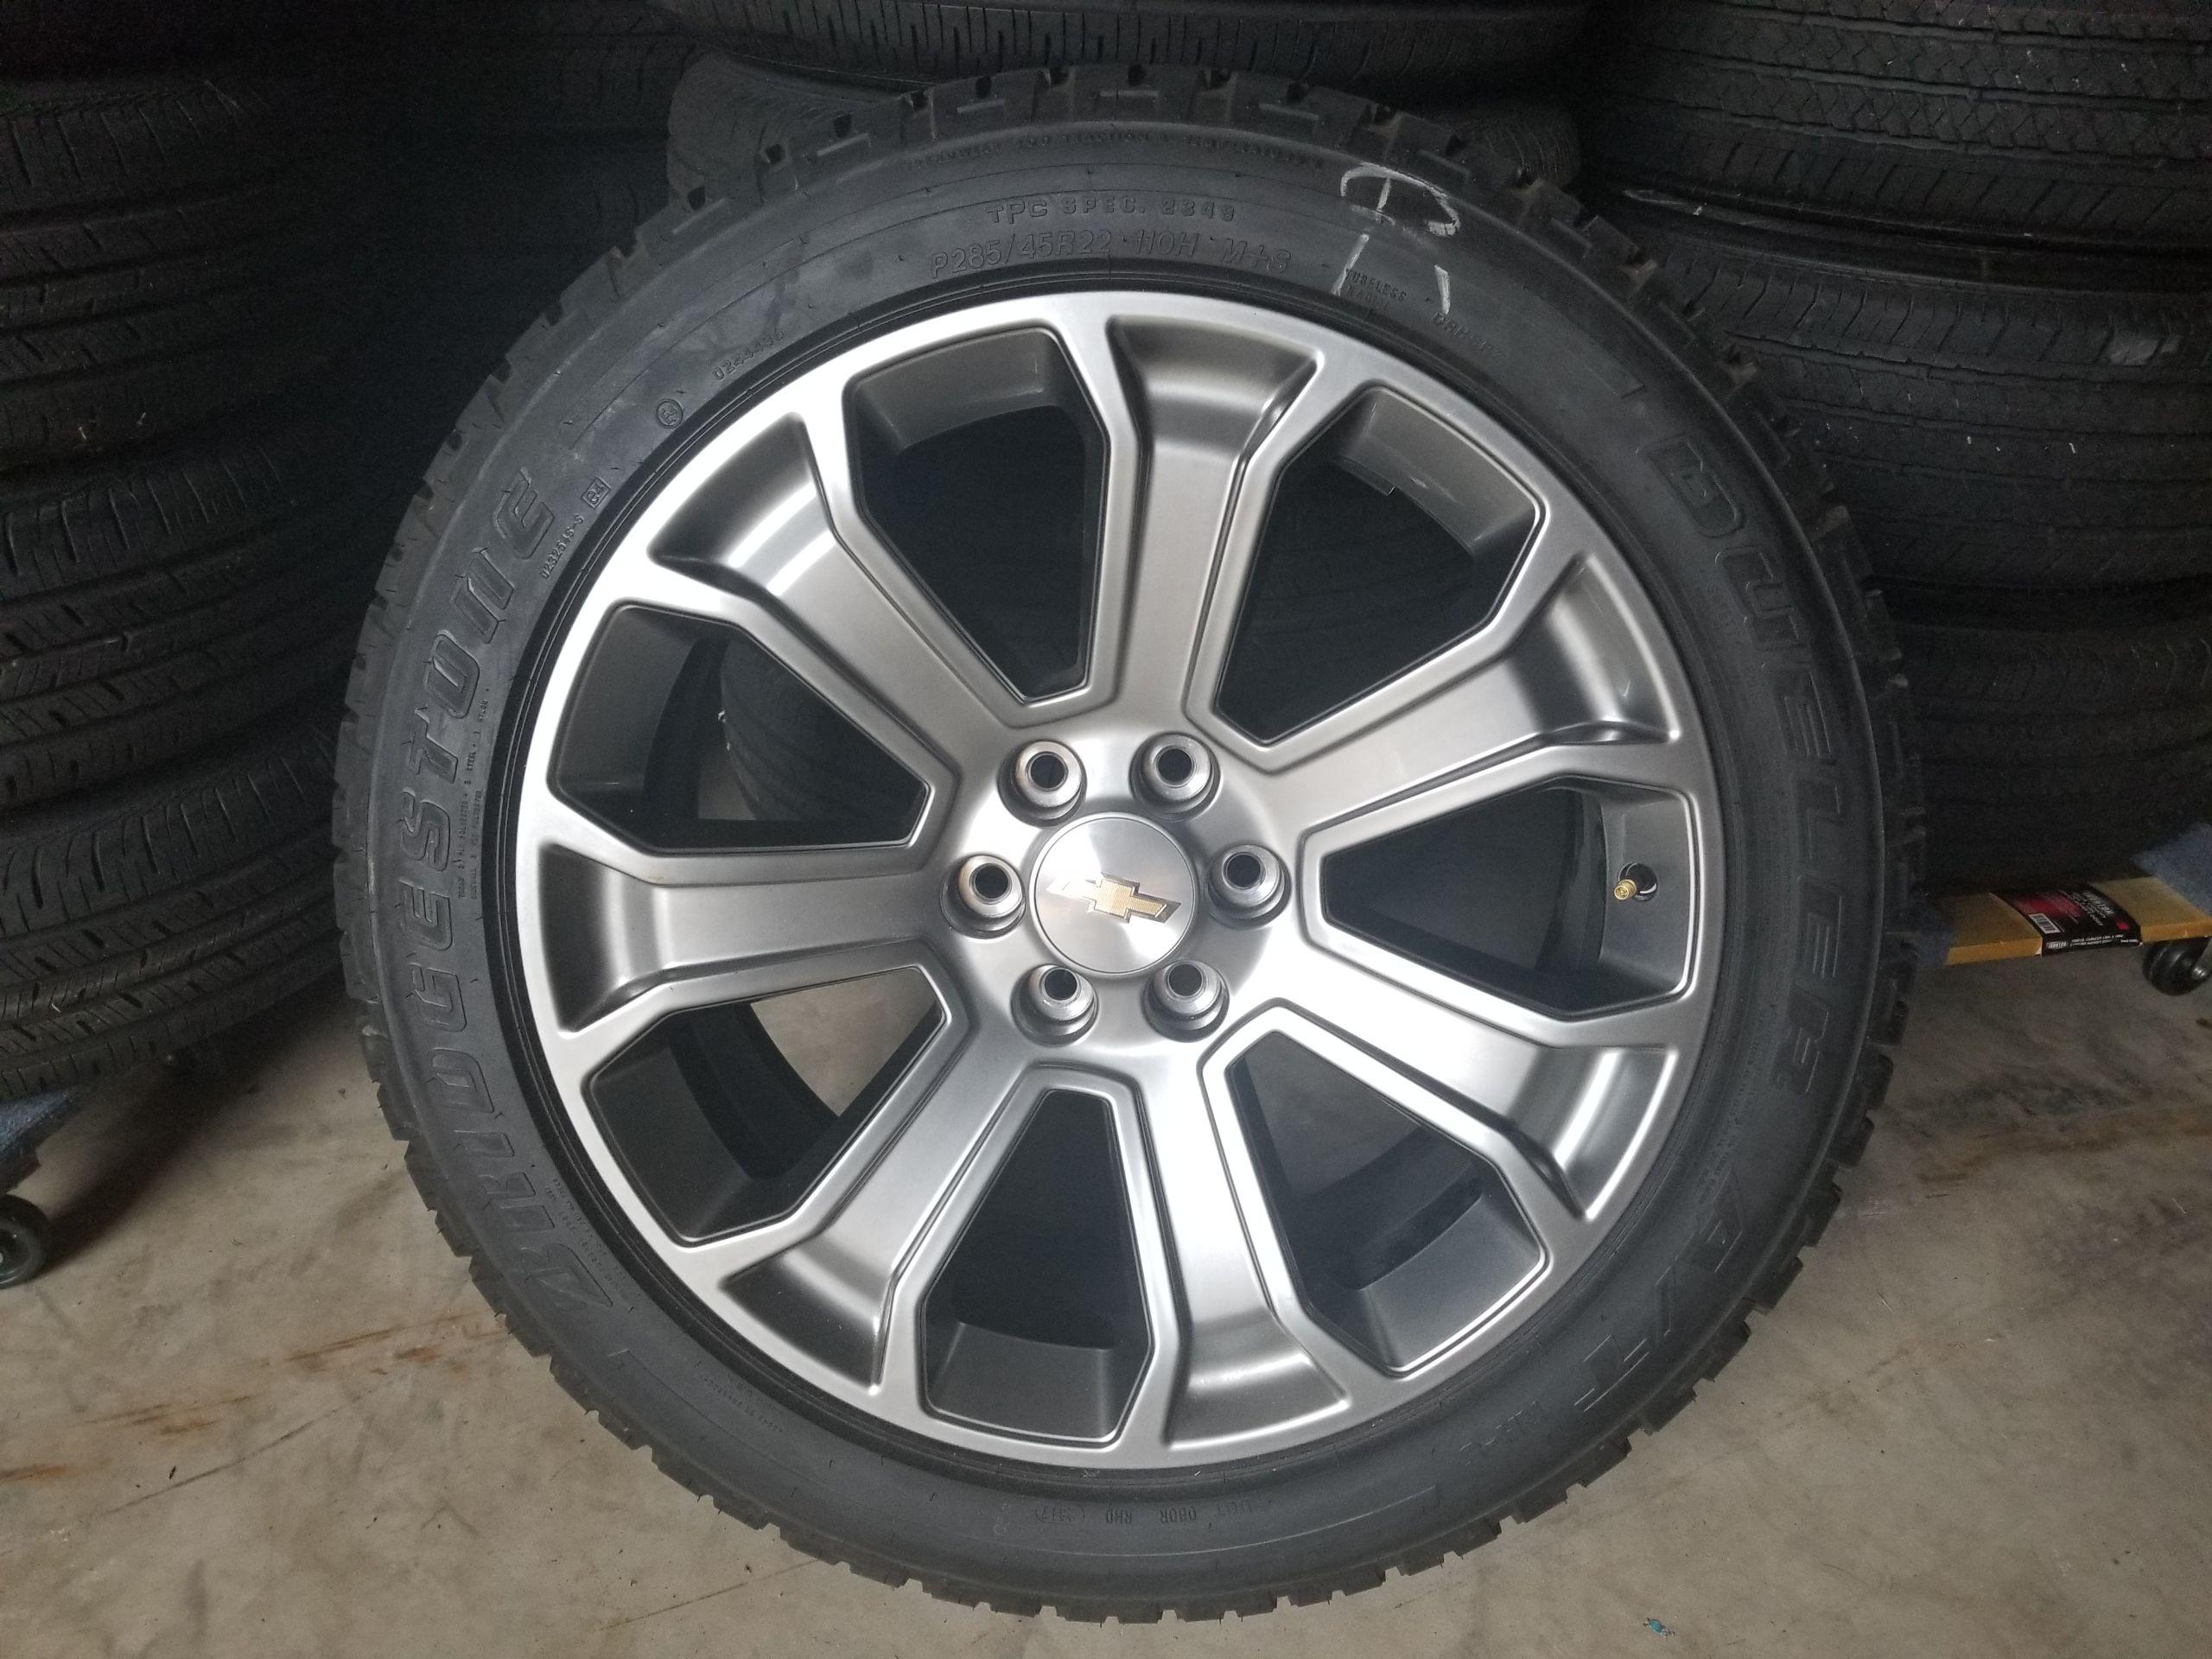 Chevy 22 factory oem wheels